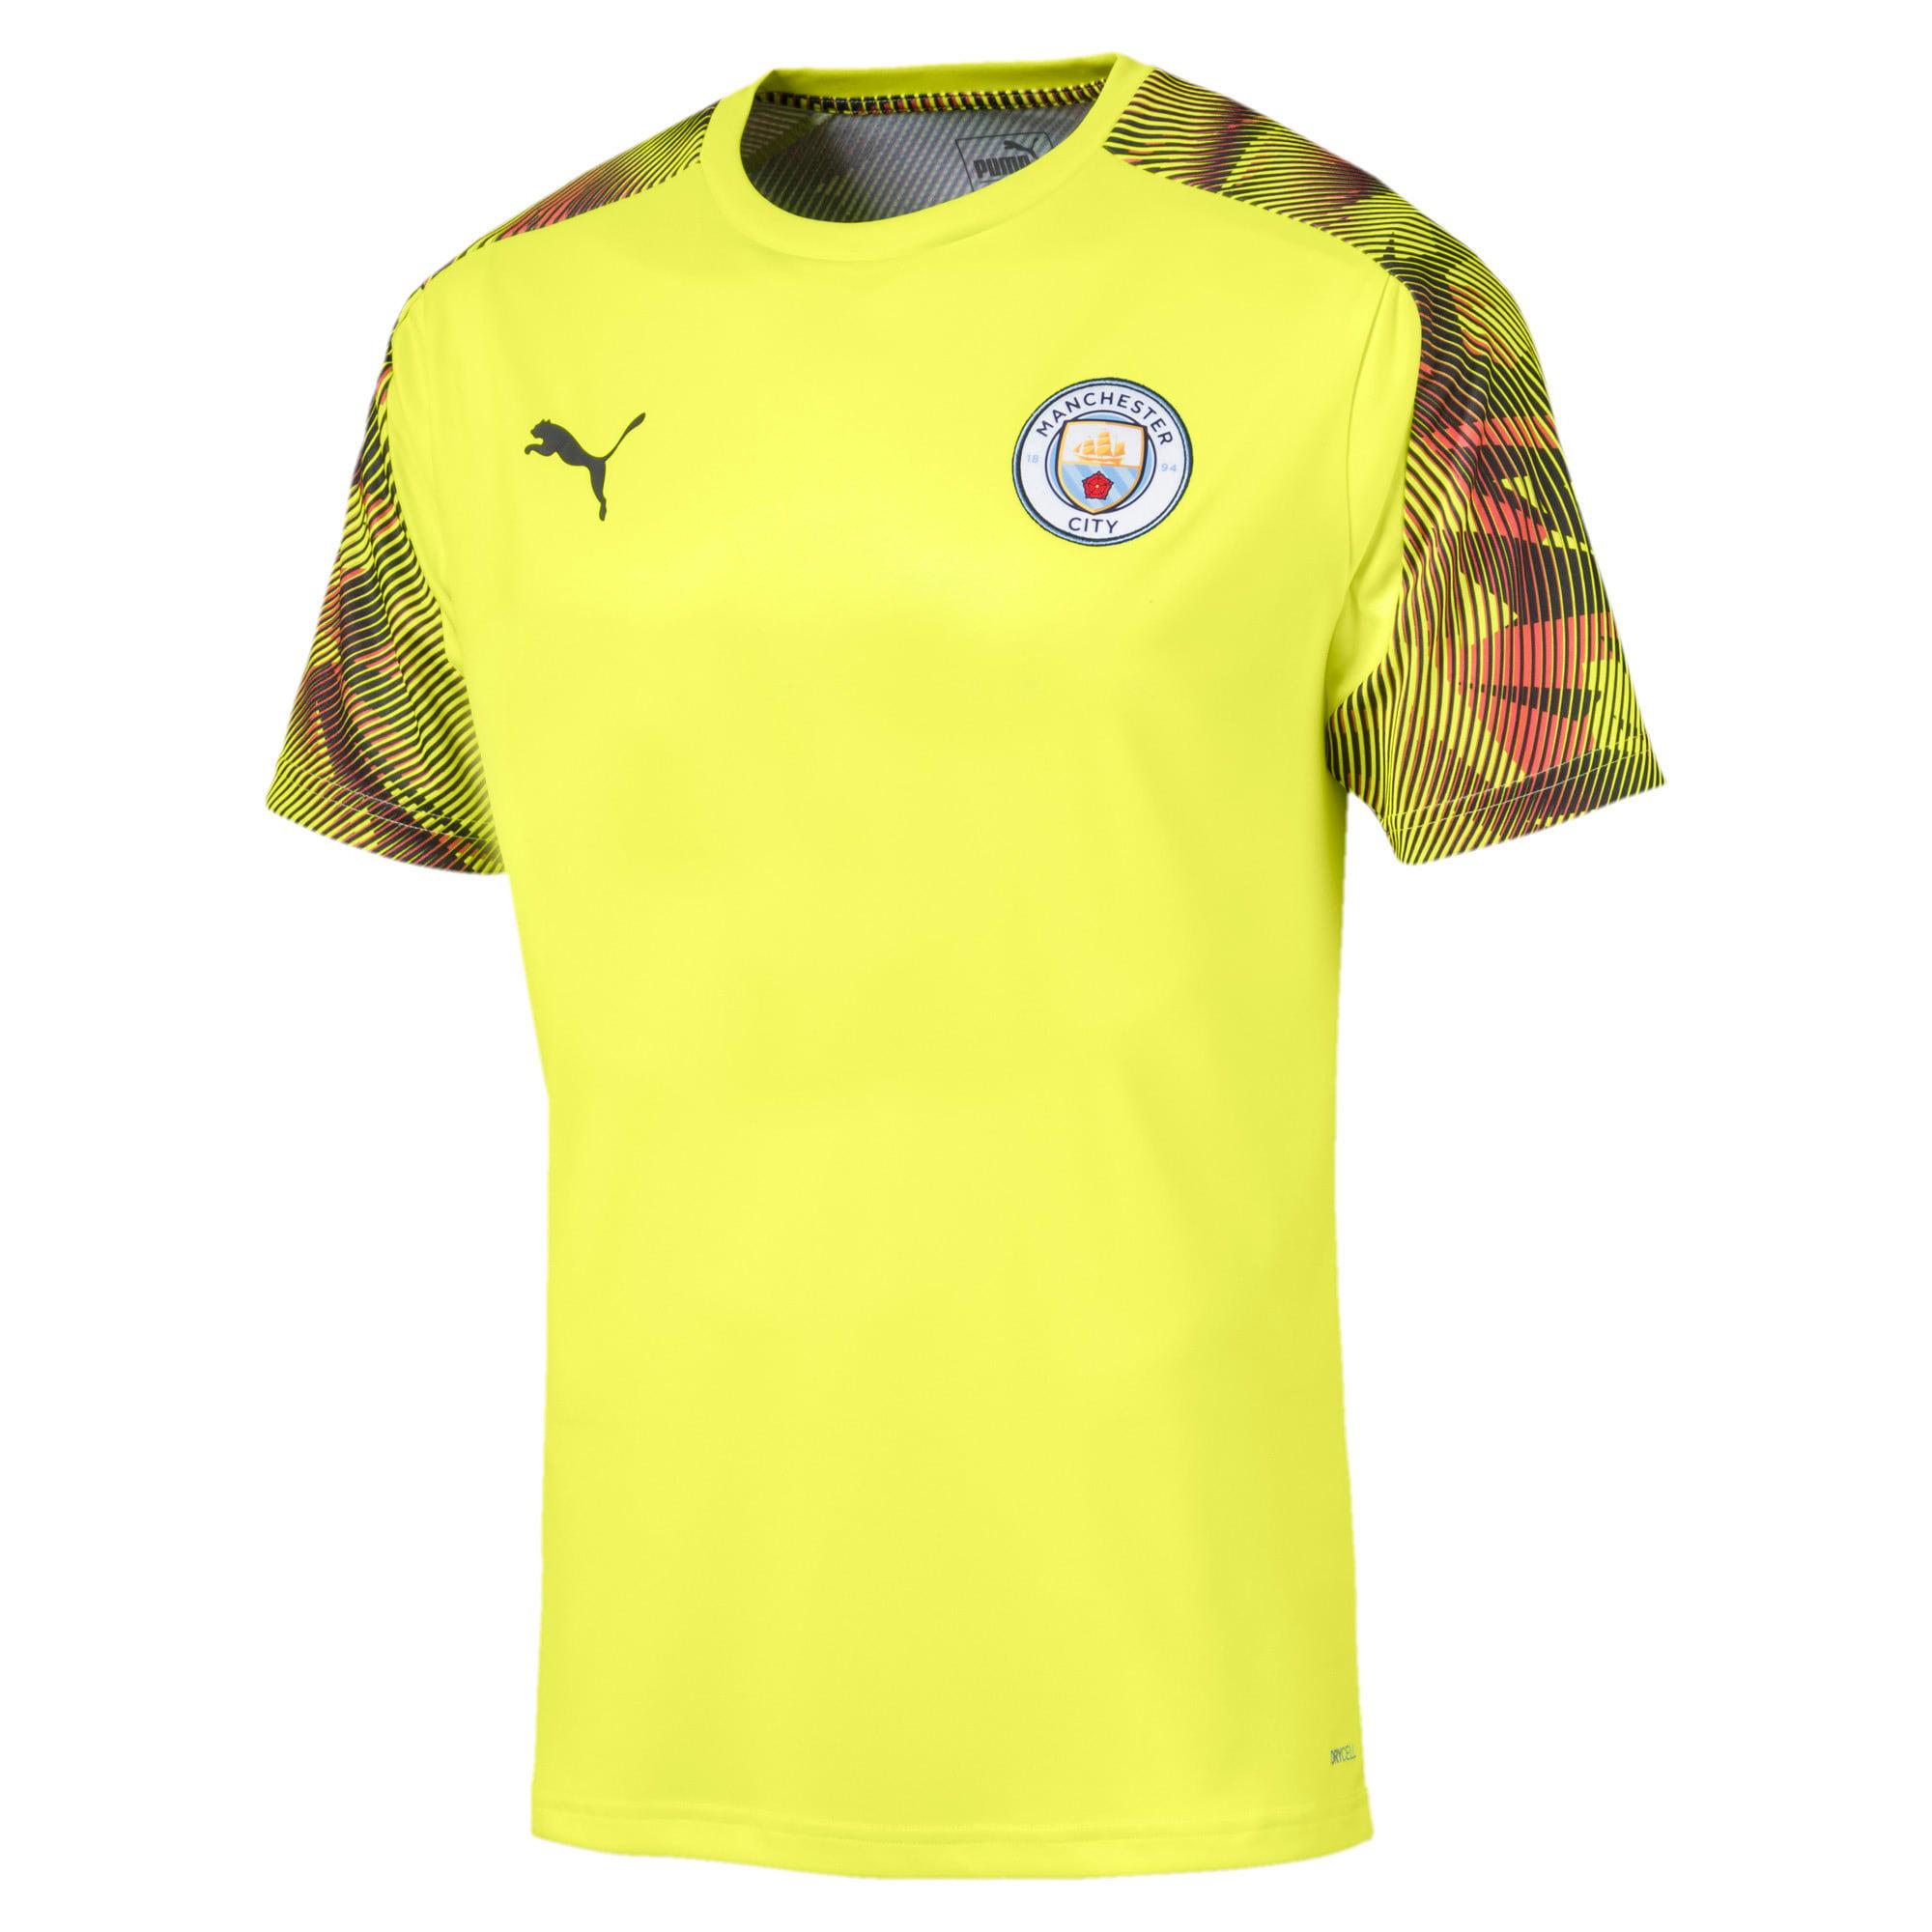 Imagen en miniatura 1 de Camiseta de training de hombre Man City, Fizzy Yellow-Asphalt, mediana